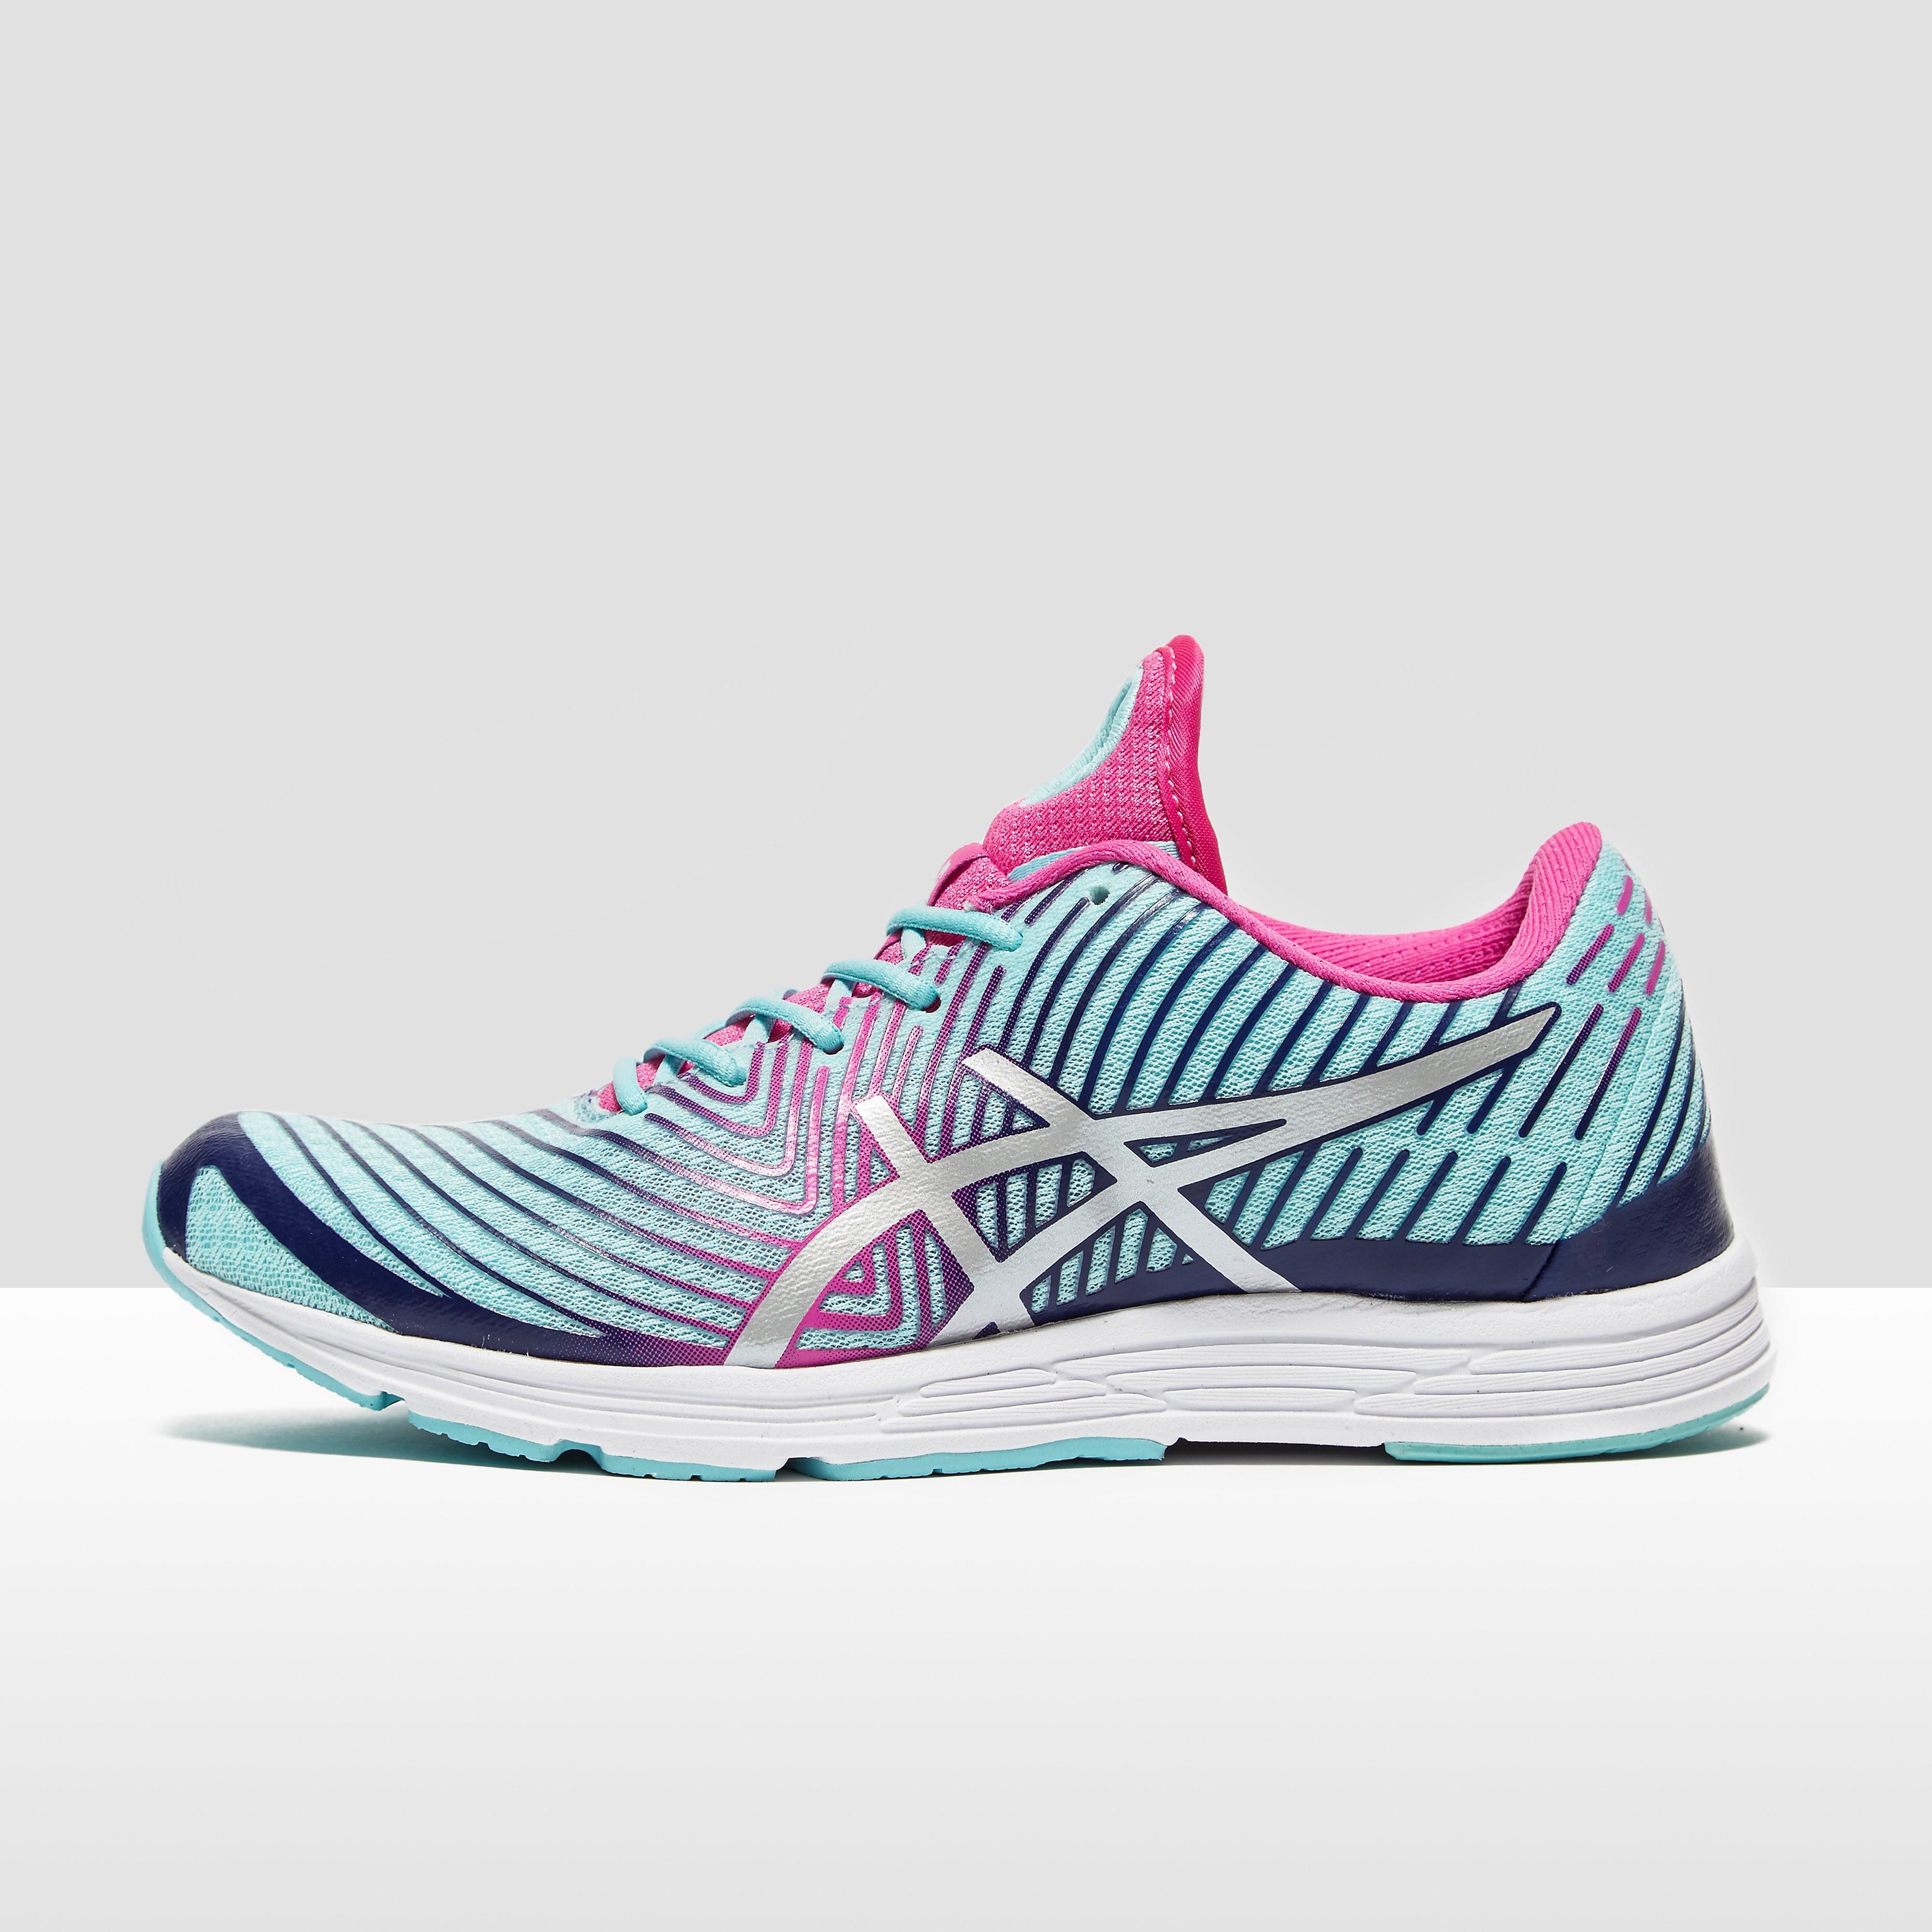 ASICS GEL-HYPER TRI 3 Running Shoes